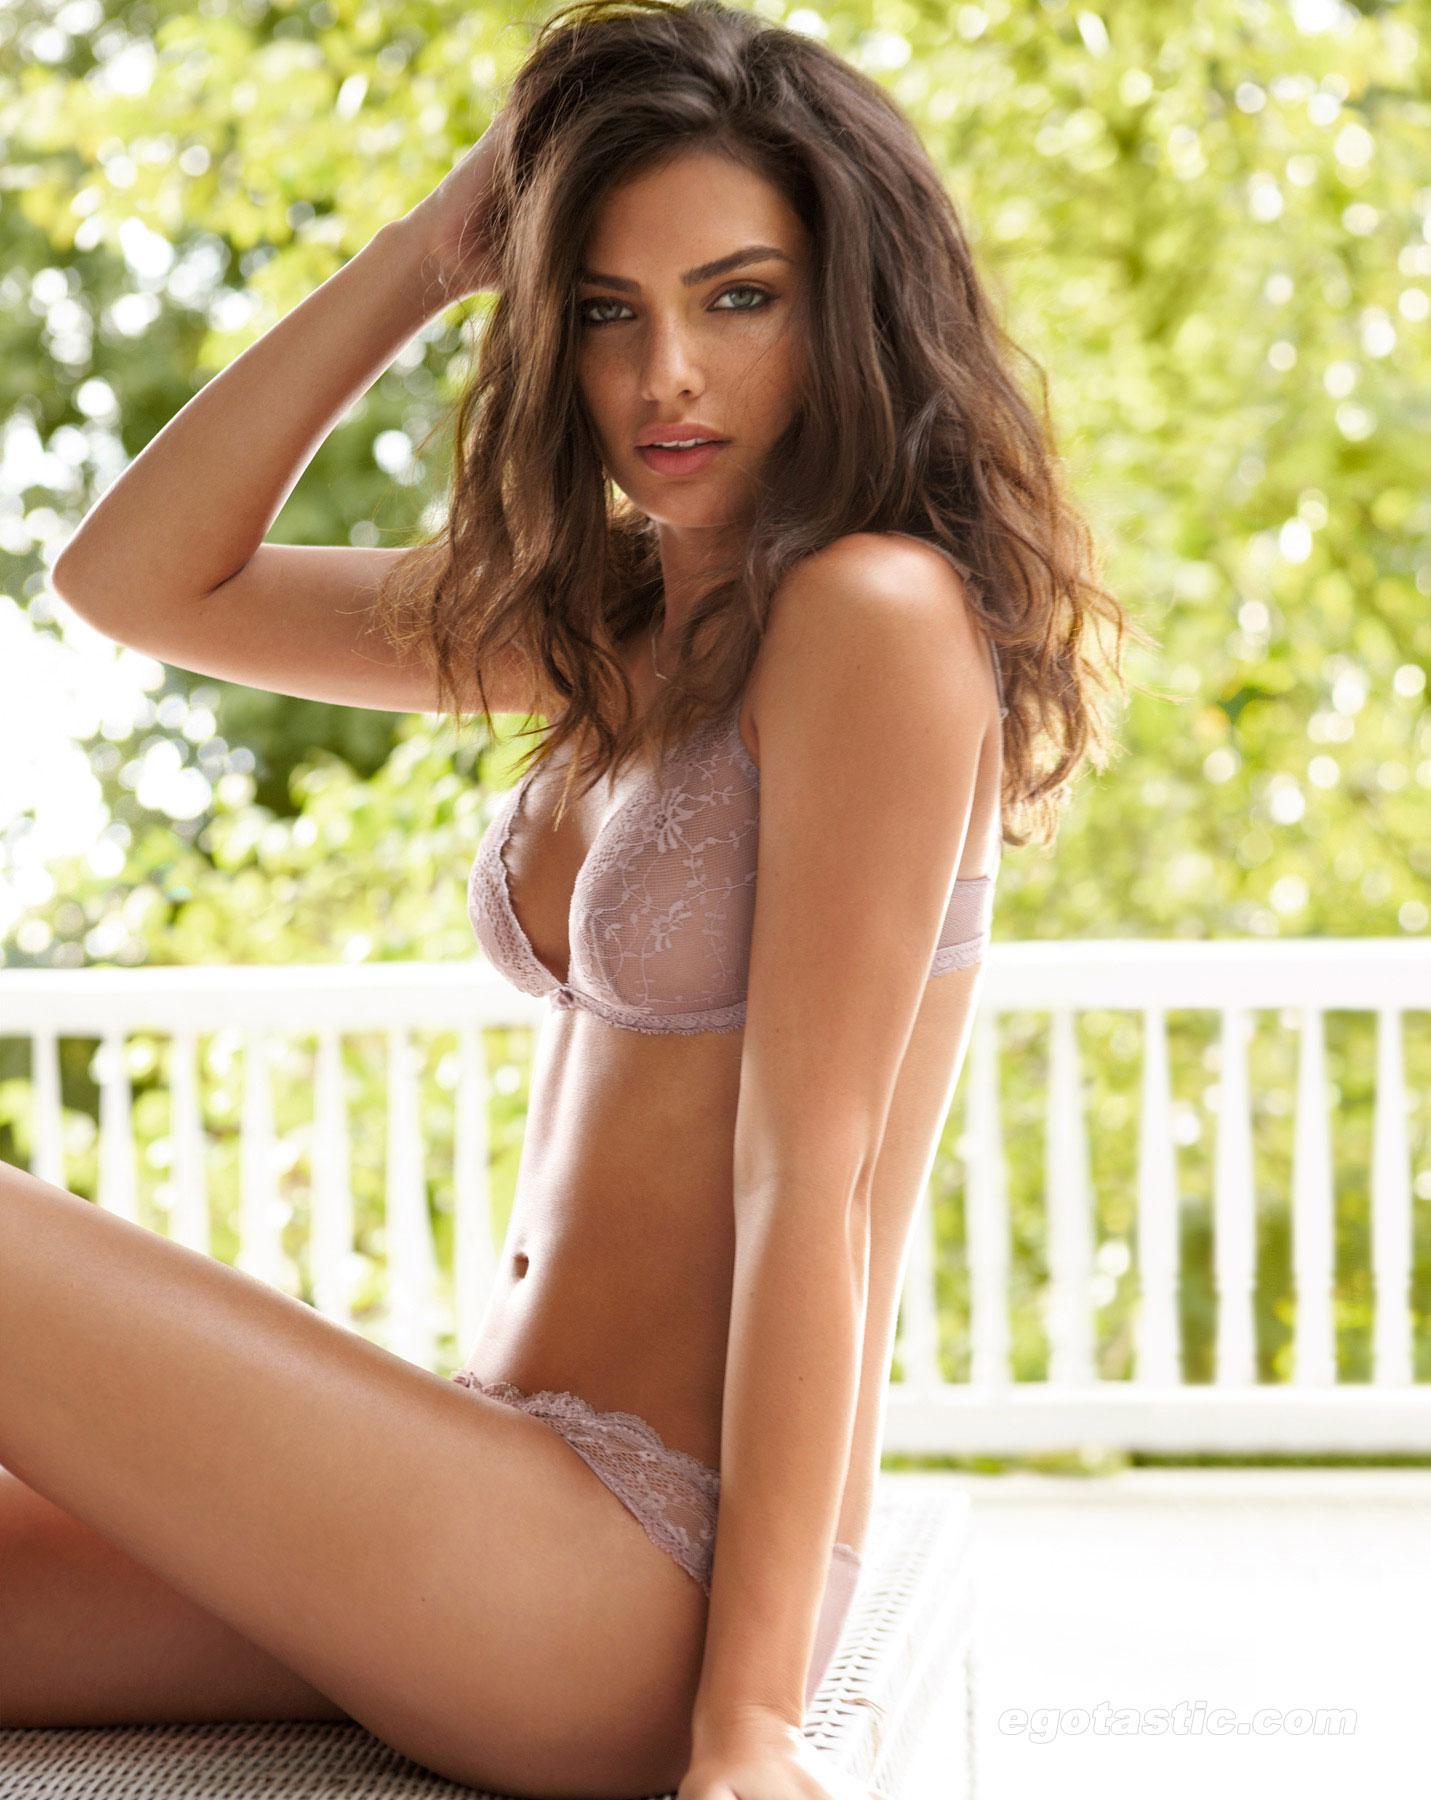 Tove lo nude pics Erotic photos Blanca Blanco Selfies - 27 Photos,Albina Mul Topless